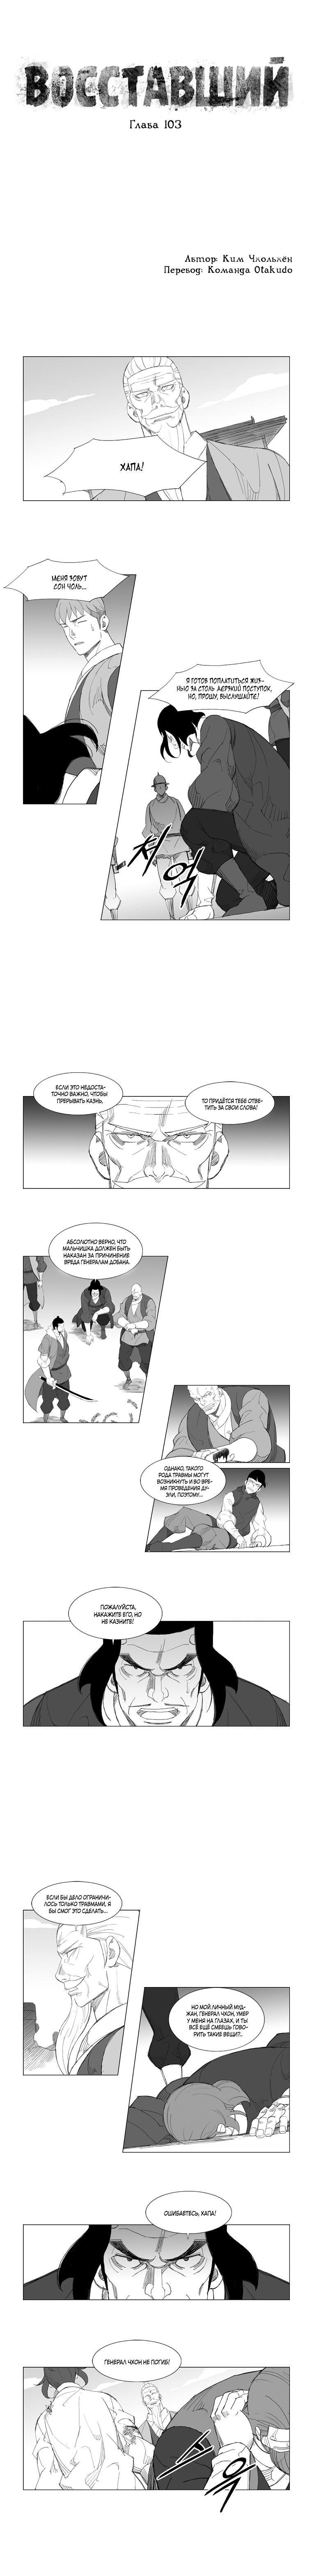 https://r1.ninemanga.com/comics/pic2/39/28263/411782/1524013570379.jpg Page 1